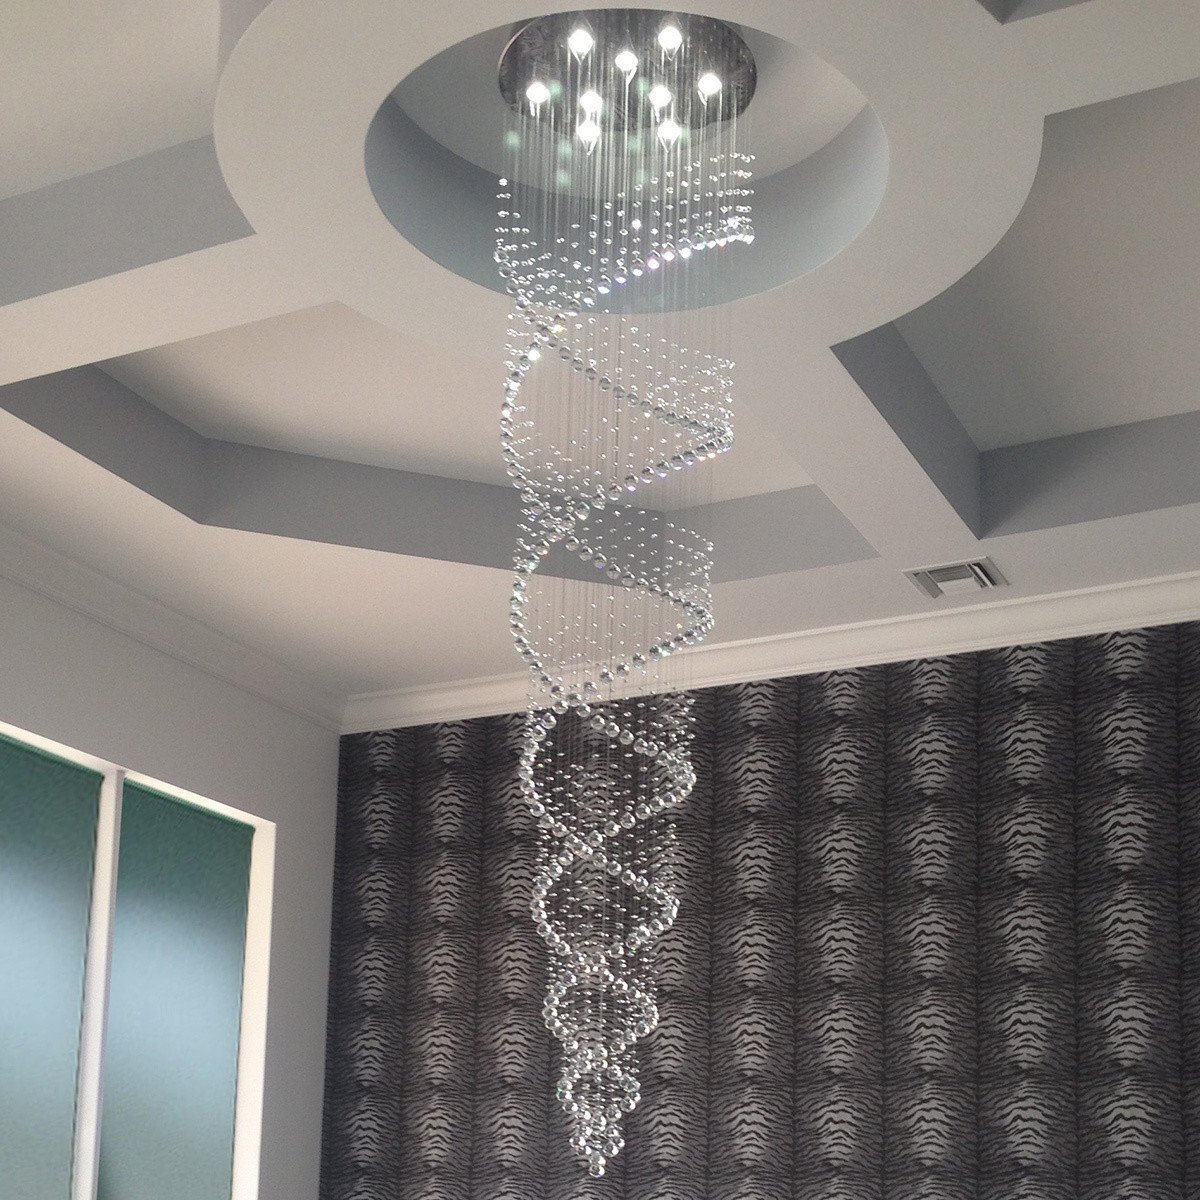 Saint Mossi Modern K9 Crystal Raindrop Chandelier Lighting Flush Led Light Simple Circuit Diagram Fully Stocked Store Mount Ceiling Fixture Pendant Lamp For Dining Room Bathroom Bedroom Livingroom